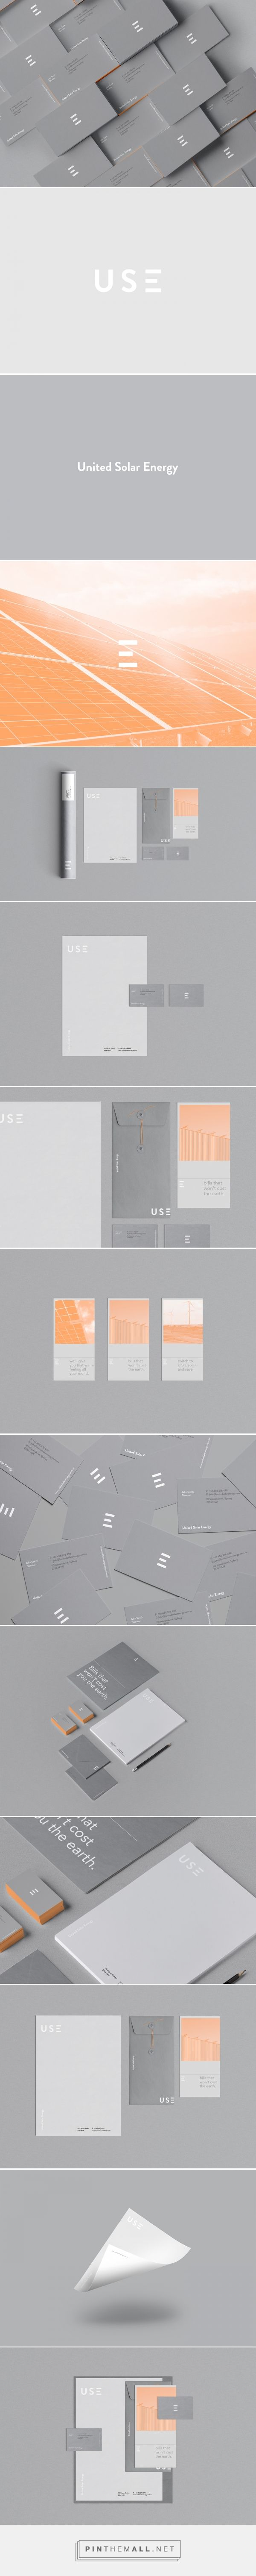 609 best Graphics Design Inspiration images on Pinterest